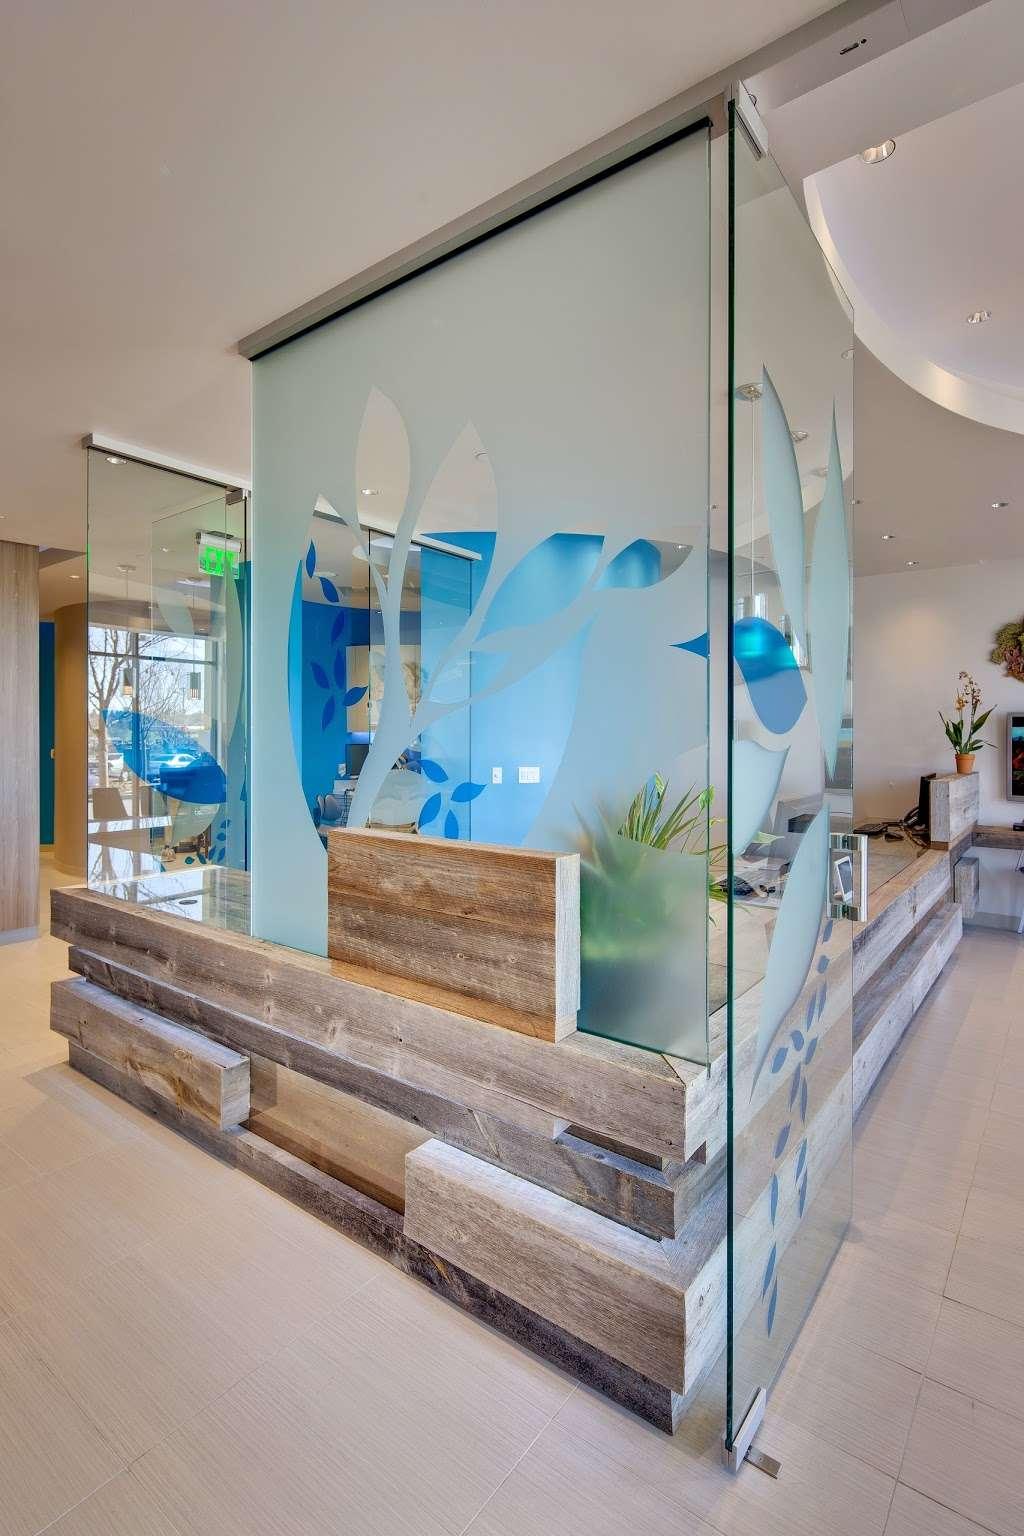 Encore Dental - dentist  | Photo 7 of 10 | Address: 6040 Main St, American Canyon, CA 94503, USA | Phone: (707) 562-4090